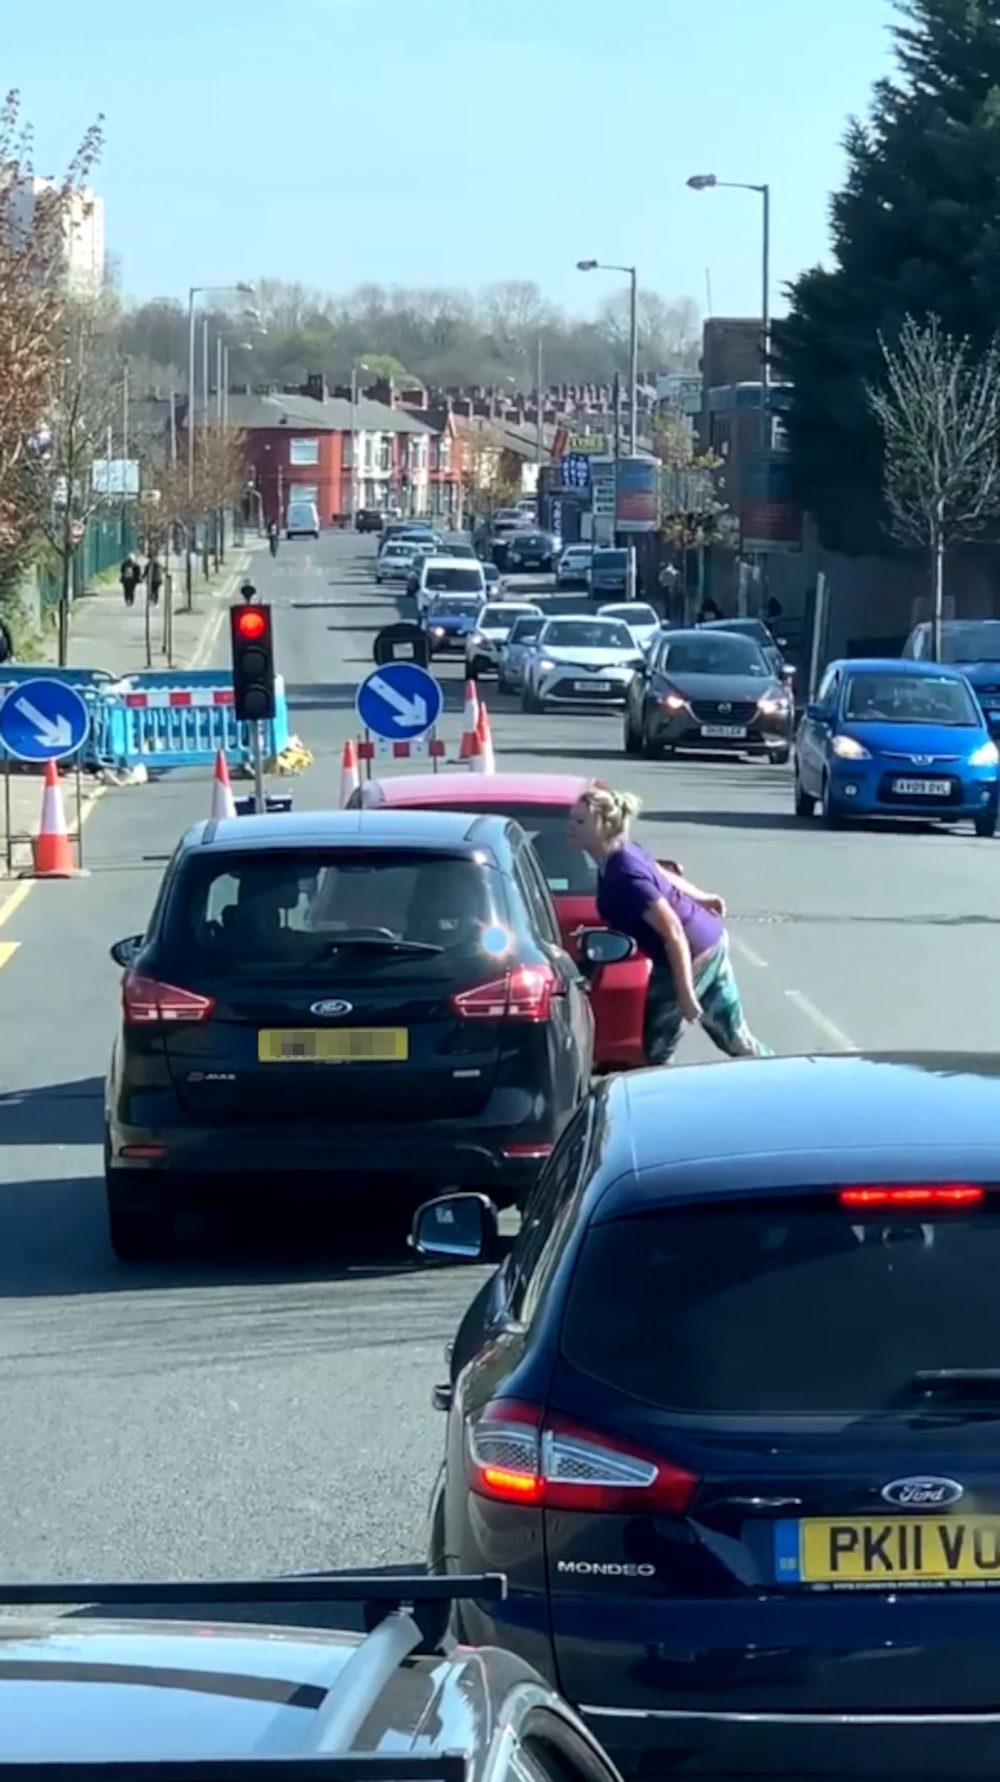 Woman spits on car   Transport News UK